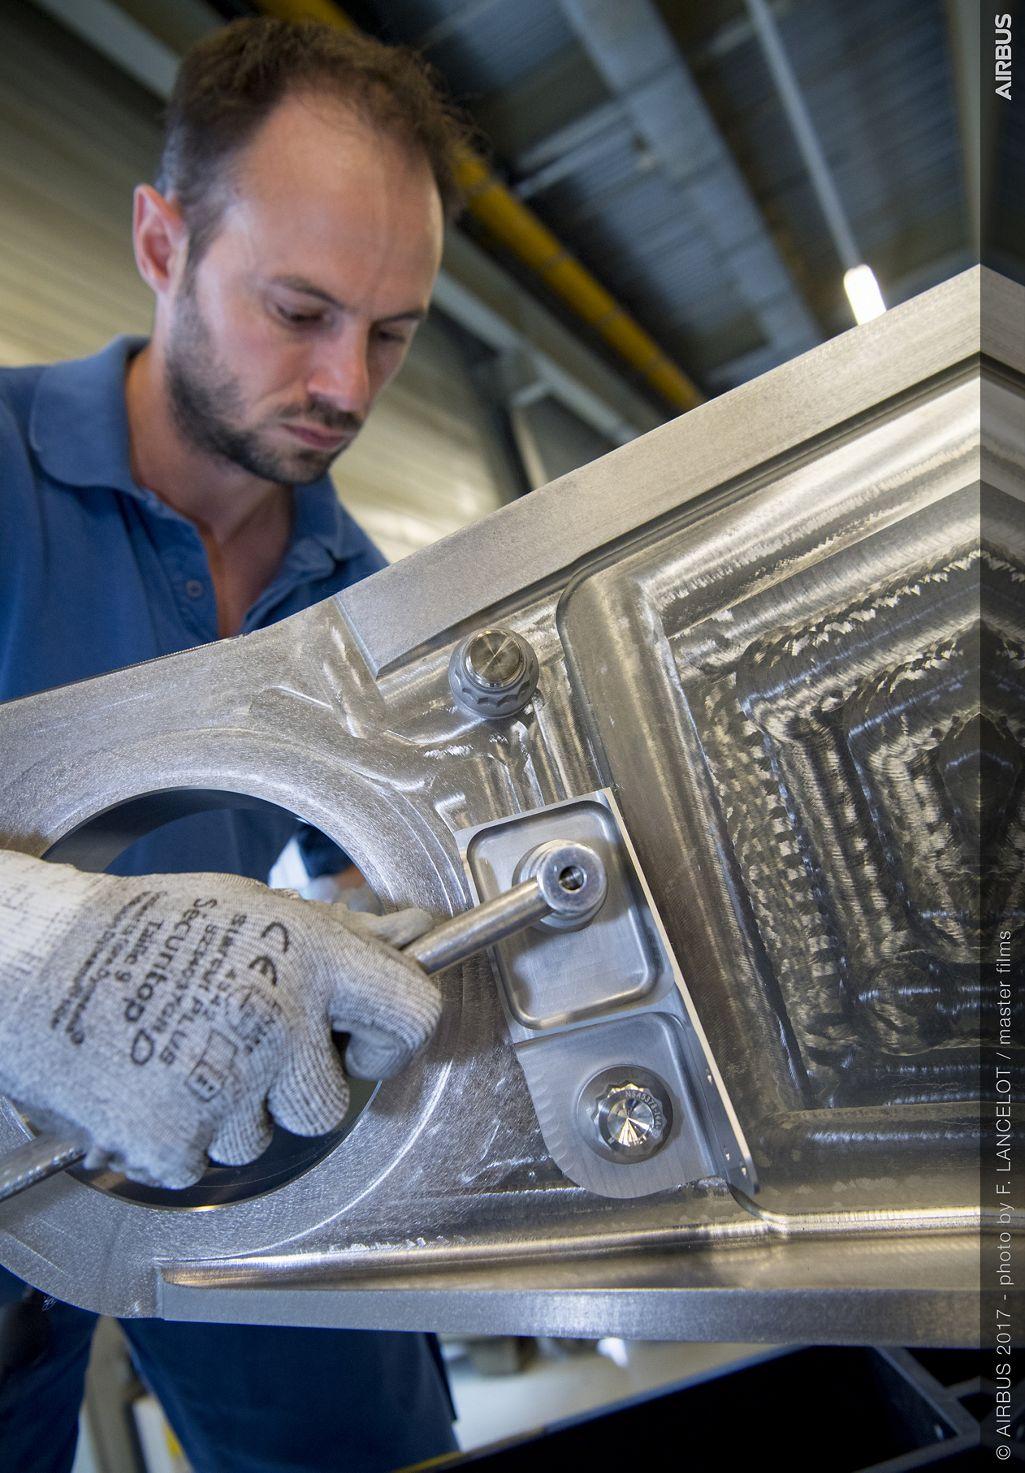 airbus 3d gedrucktes bauteil installation A350xwb - In Kürze: Airbus installiert erstes 3D-gedrucktes Bauteil, AP&C Produktionsanlage, BASF & Farsoon